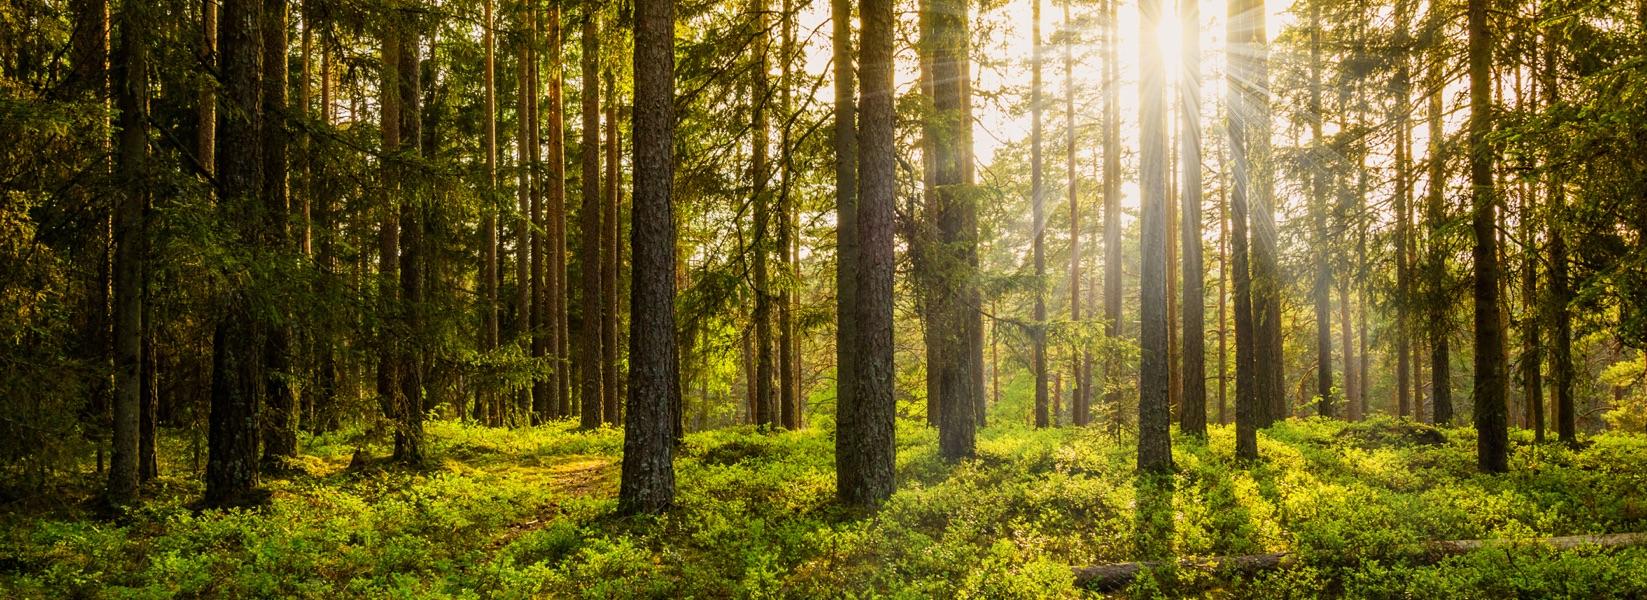 Forest   Dufferin County